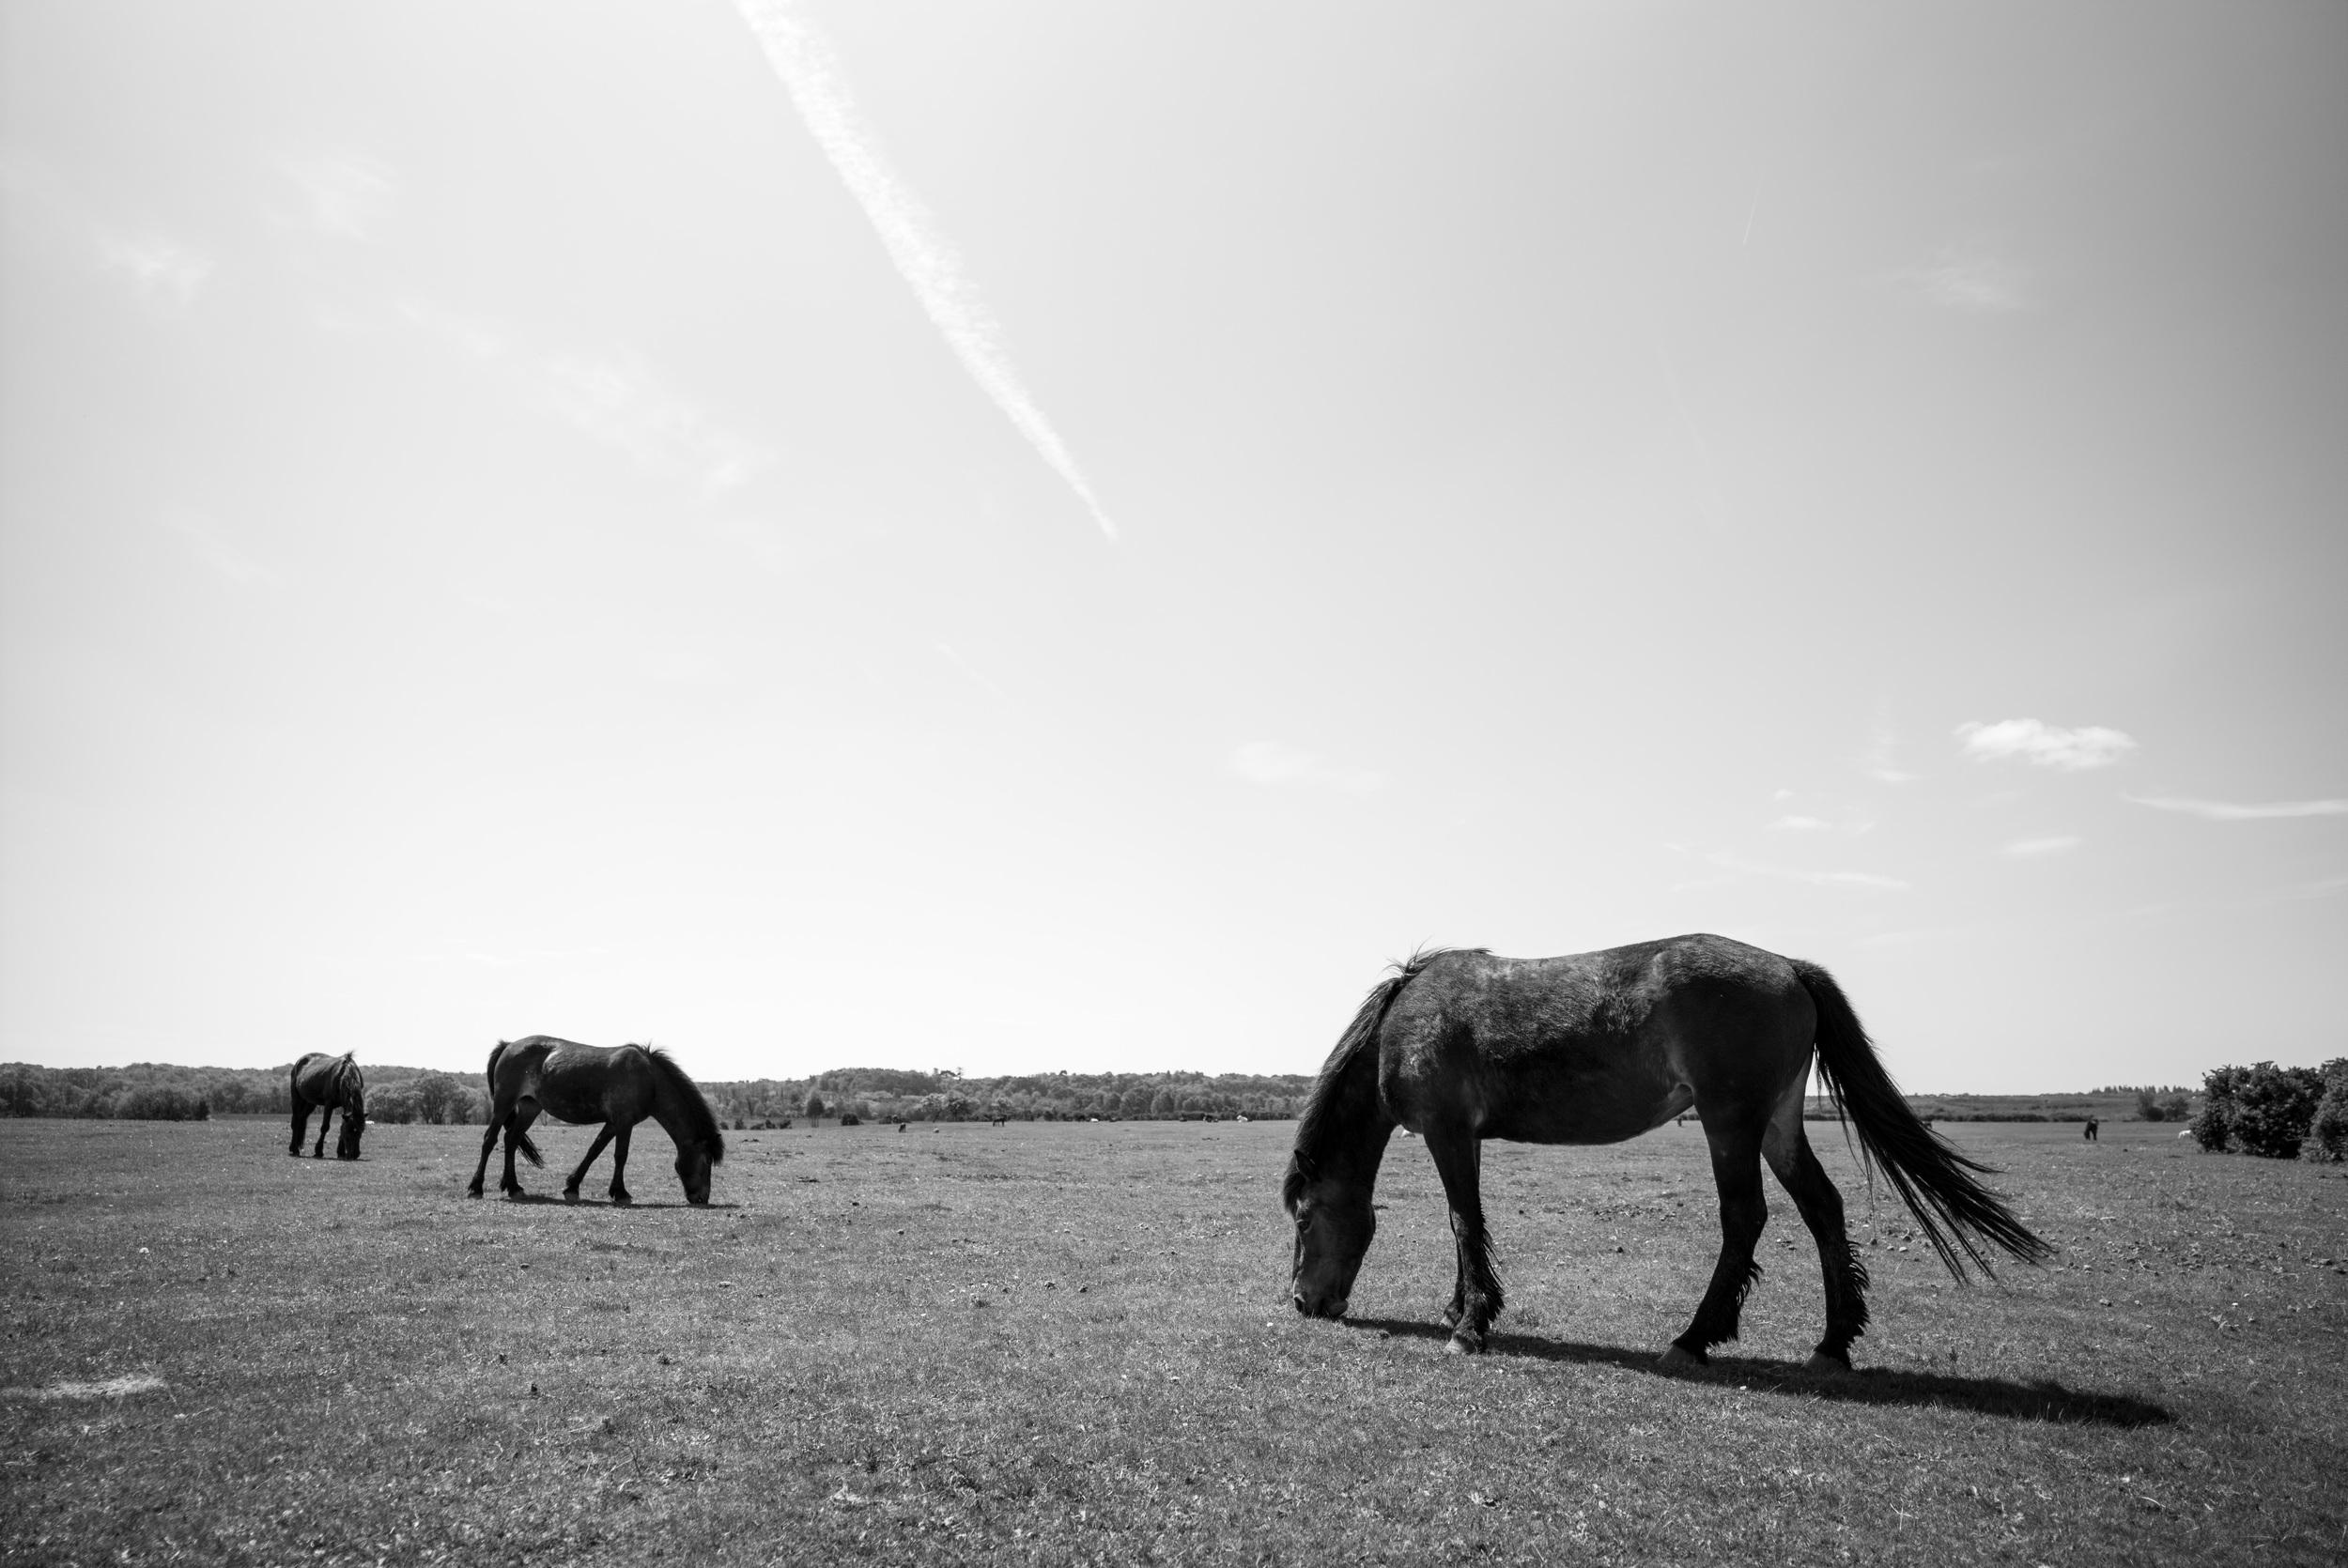 Ponies like to eat. (Leica Super-Elmar-M 21mm f/3.4 ASPH.)